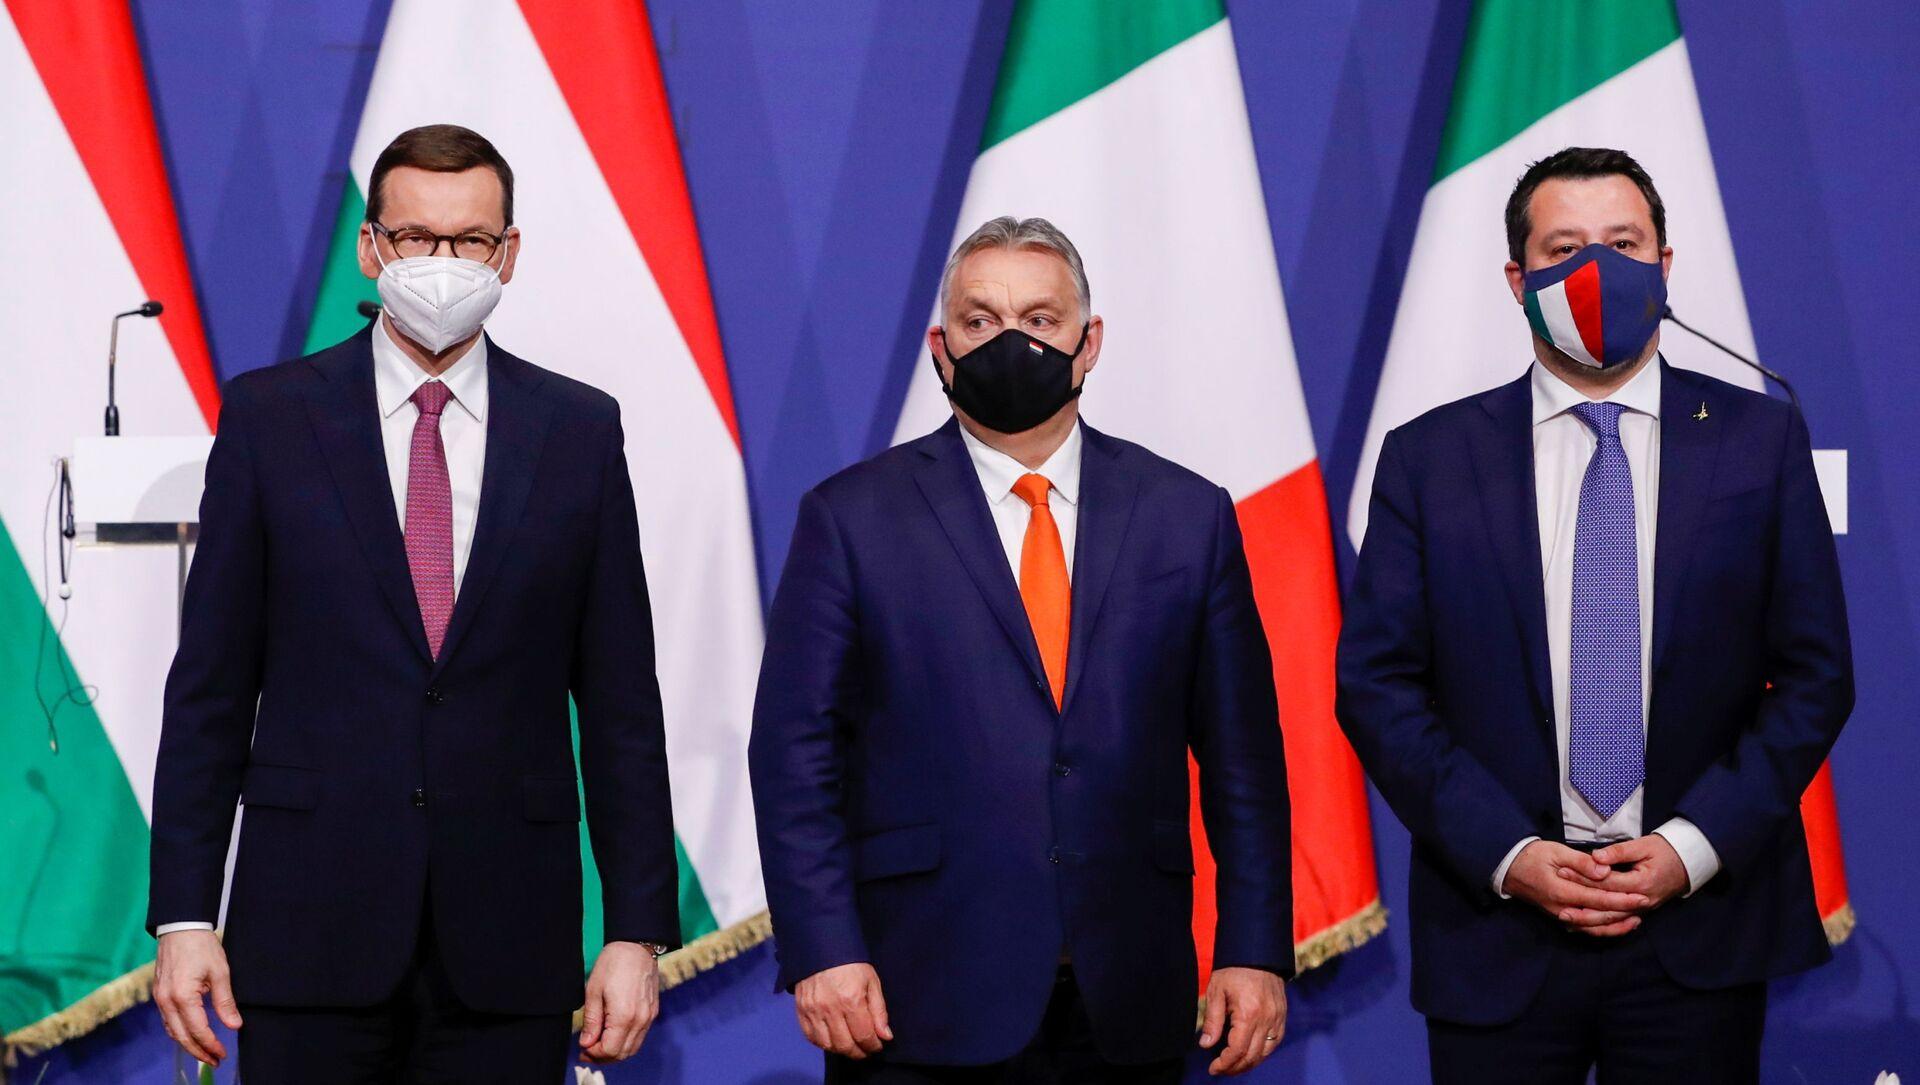 Maďarský premiér Viktor Orbán, polský premiér Mateusz Morawiecki a bývalý italský ministr vnitra Matteo Salvini v Budapešti - Sputnik Česká republika, 1920, 02.04.2021